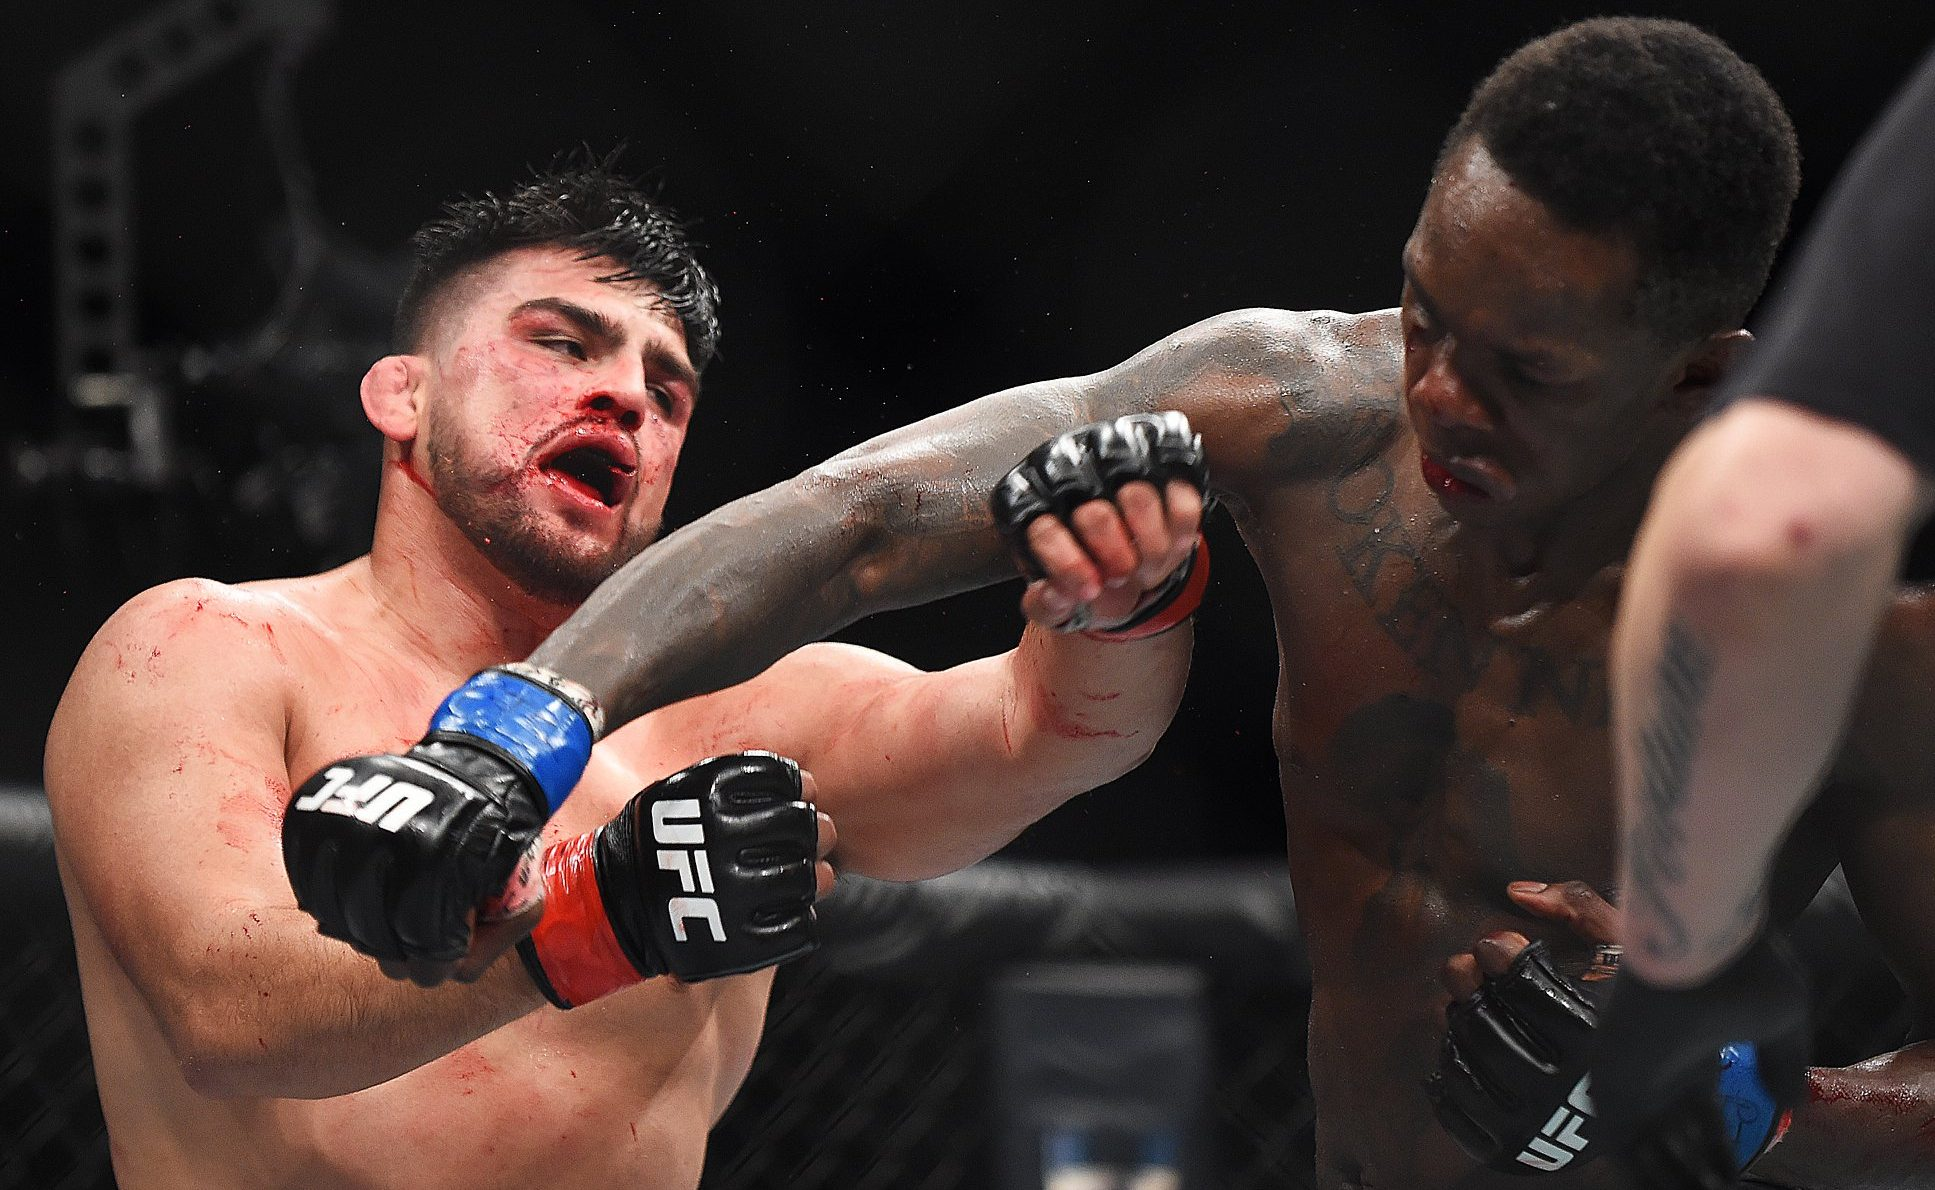 Kelvin Gastelum e Israel Adesanya fizeram a co-luta principal do UFC 236